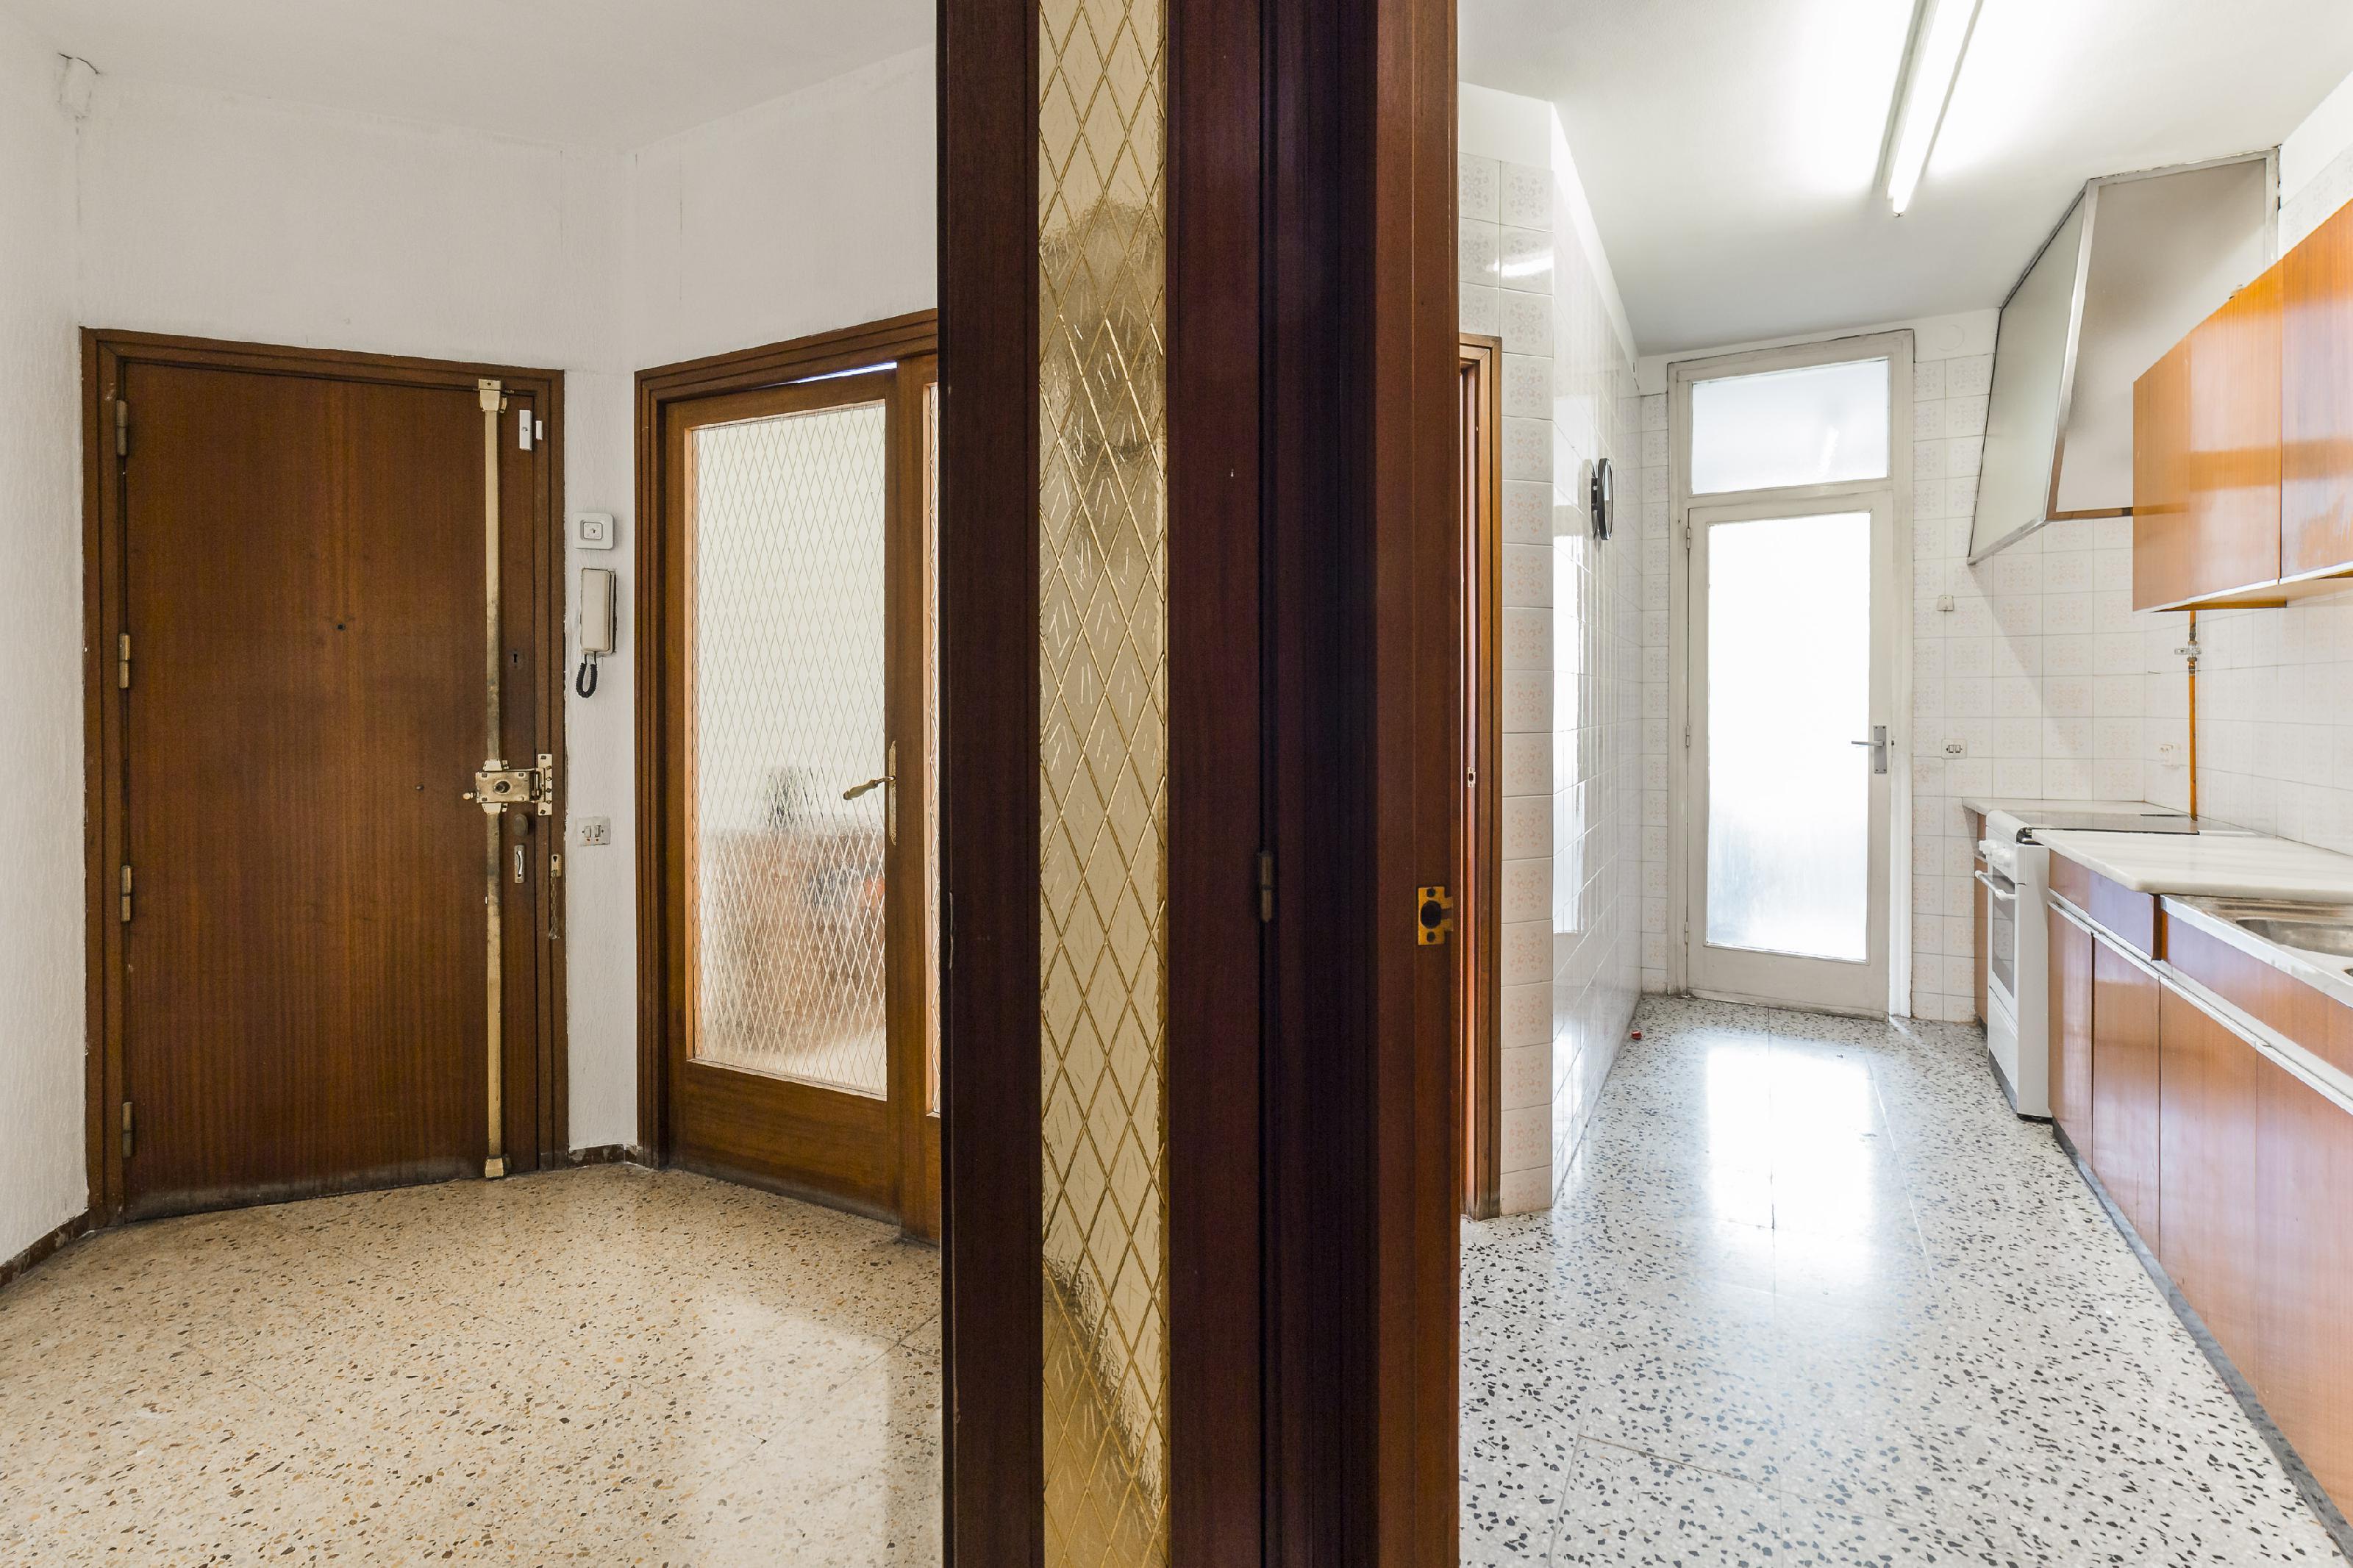 247624 Flat for sale in Eixample, Sant Antoni 10